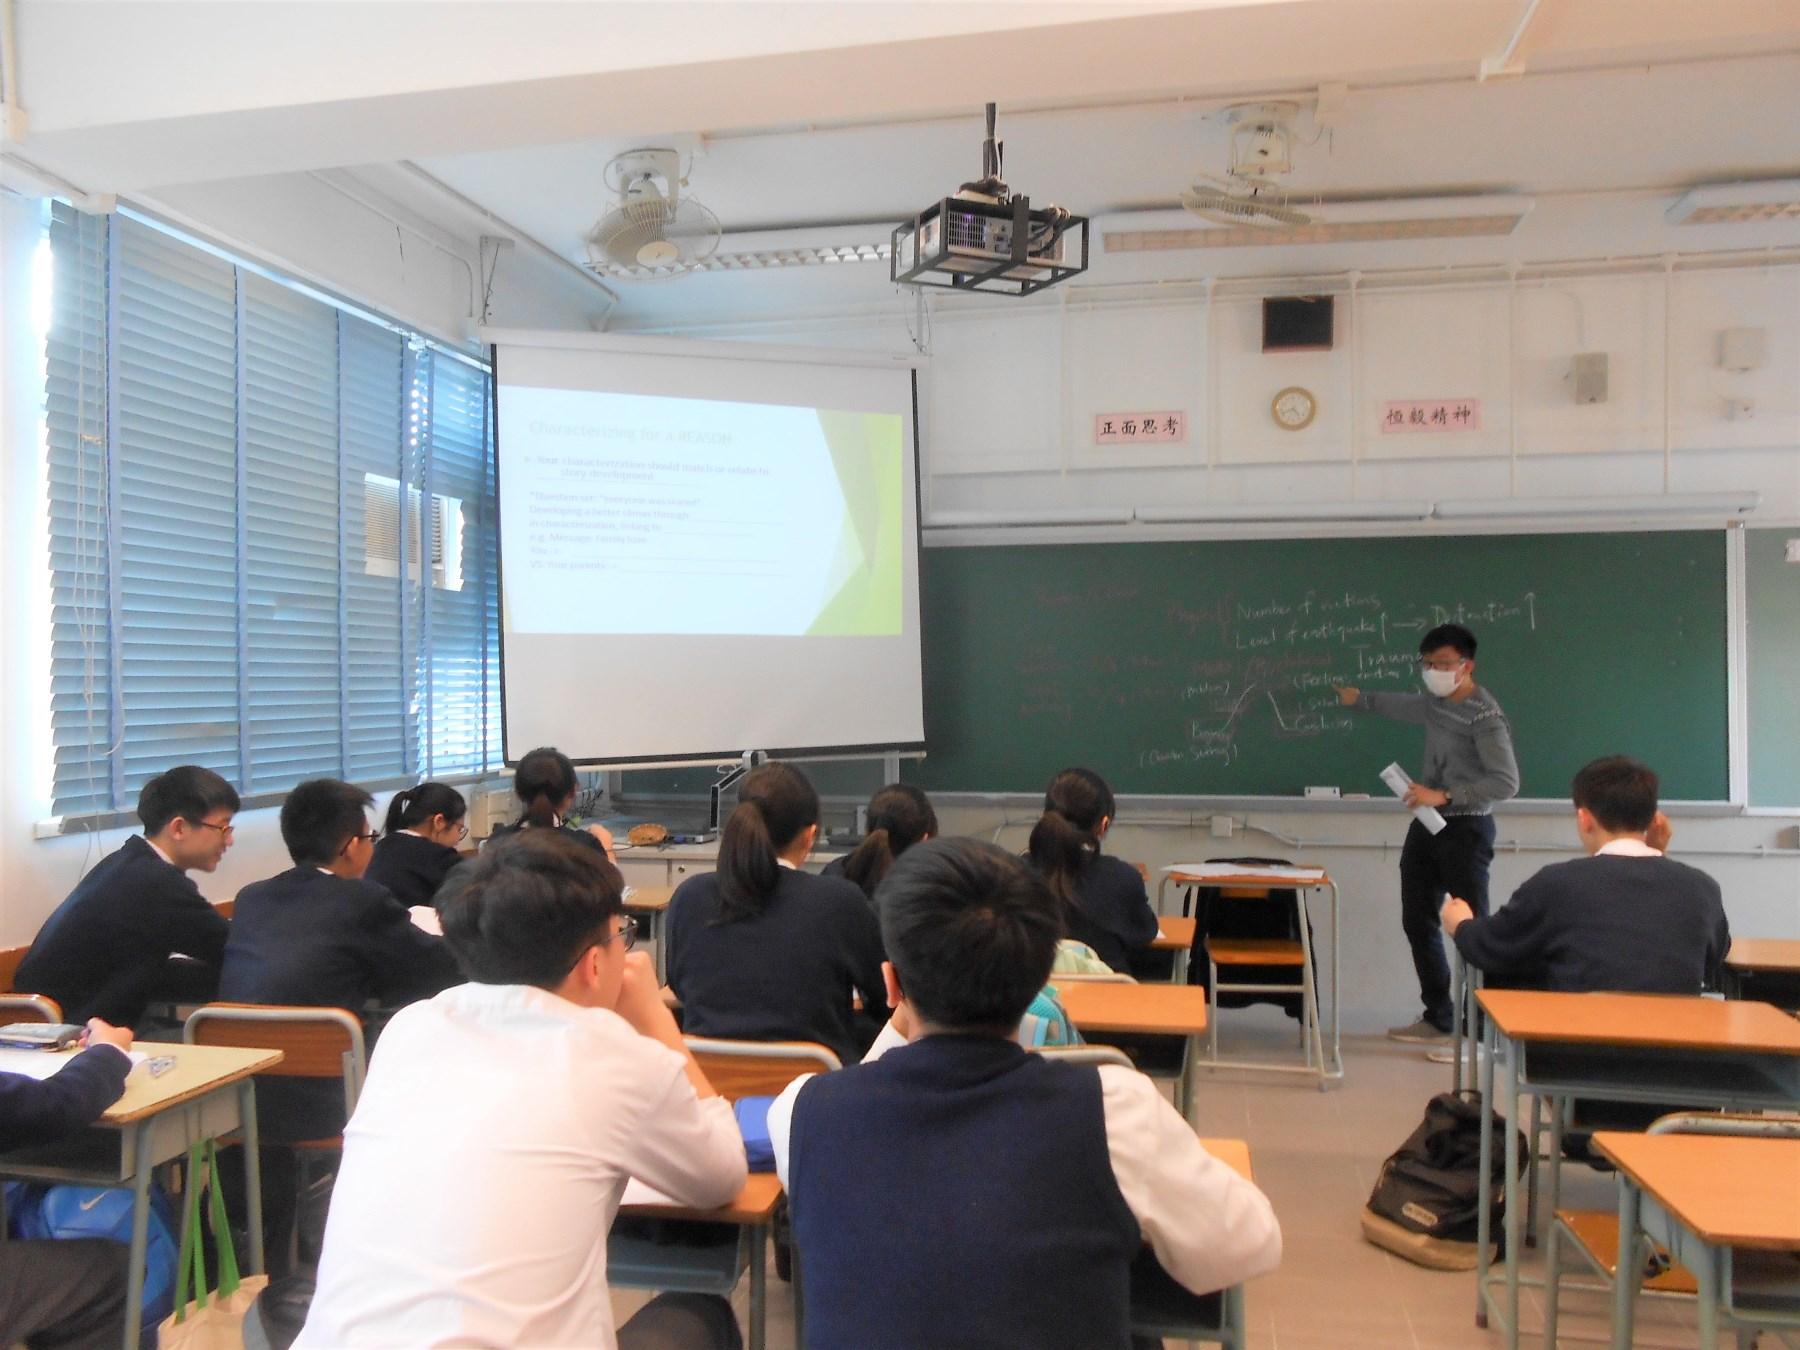 http://npc.edu.hk/sites/default/files/dscn9821.jpg